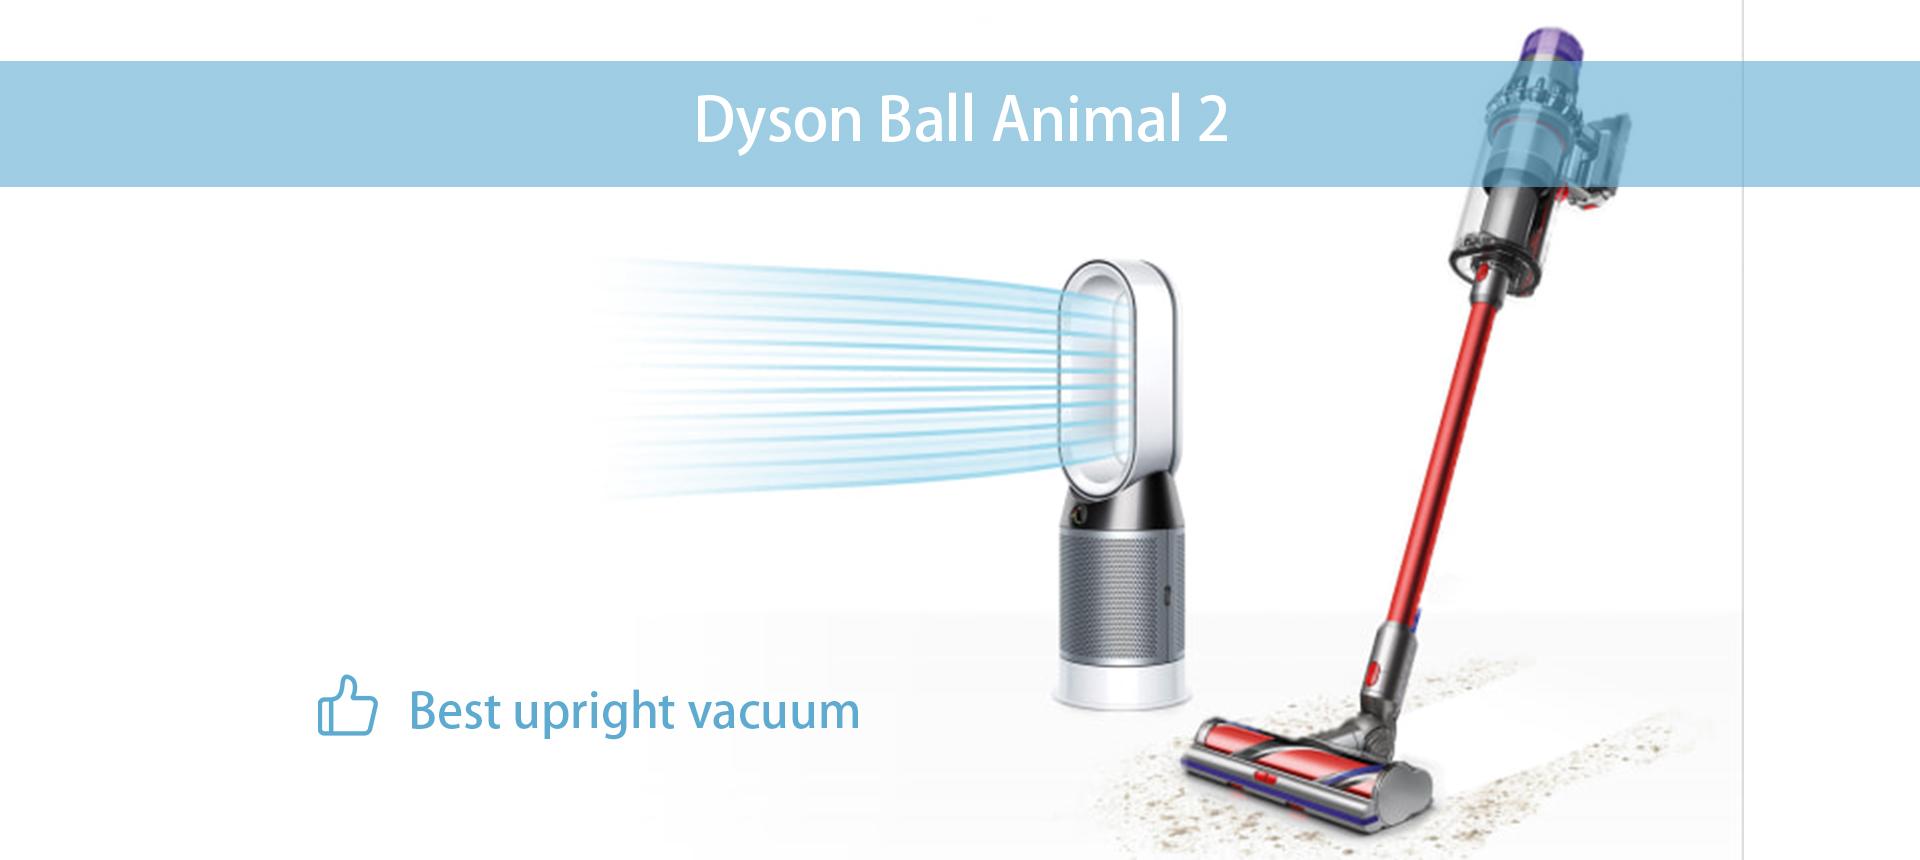 Dyson Ball Animal 2